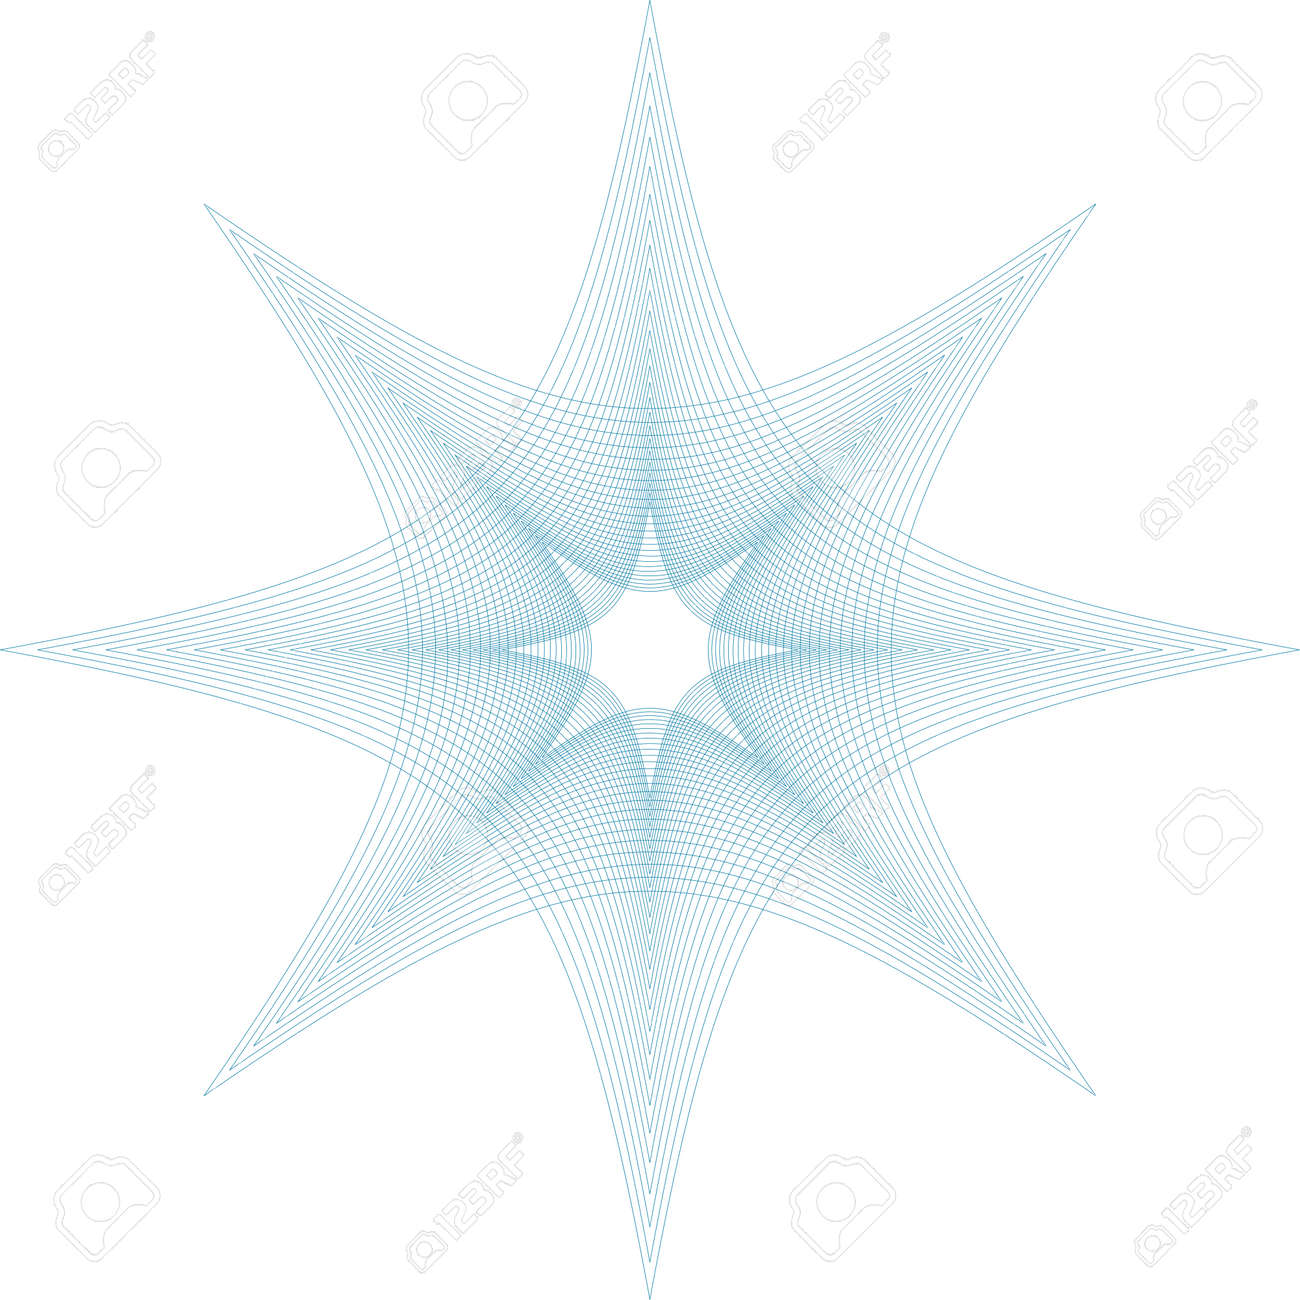 Editablbe gullioche vector pattern - 123438375